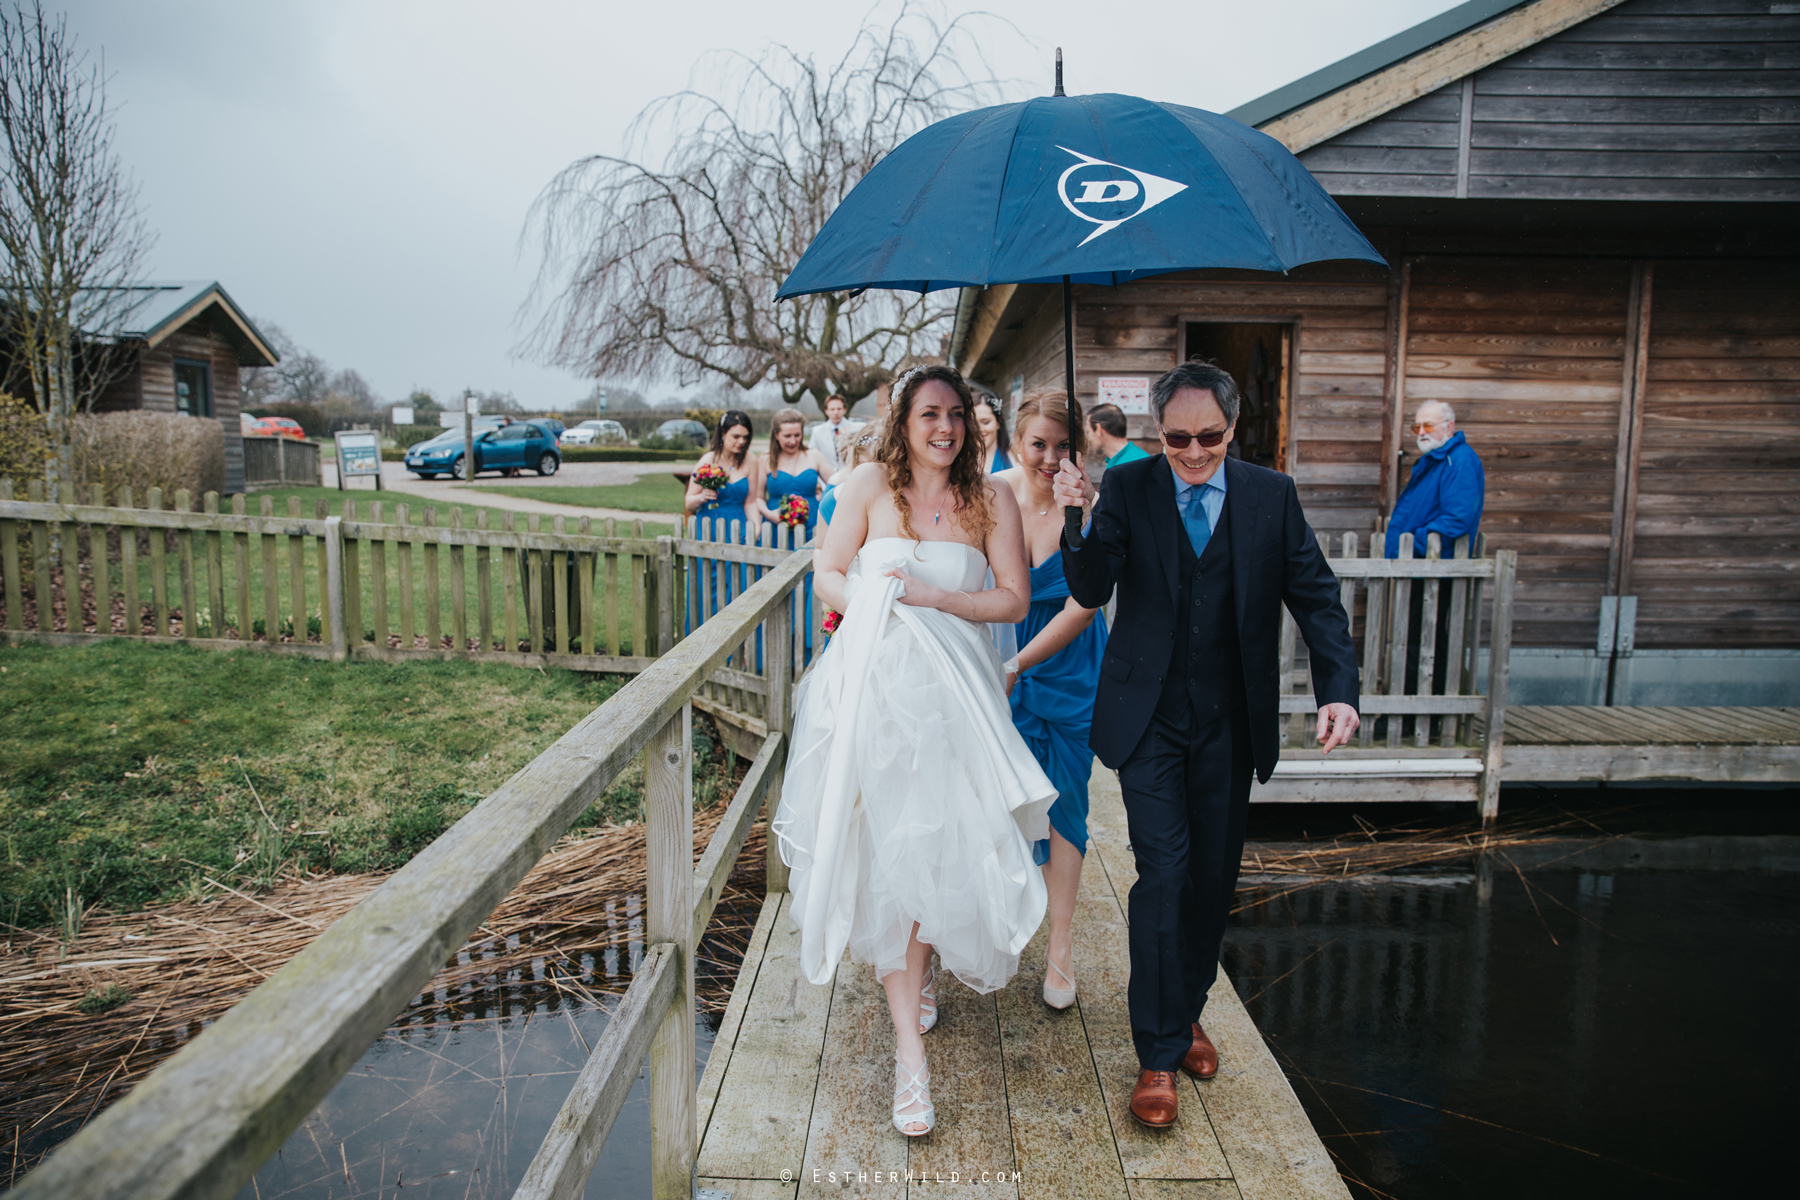 The_BoatHouse_Wedding_Venue_Ormesby_Norfolk_Broads_Boat_Wedding_Photography_Esther_Wild_Photographer_IMG_0732.jpg